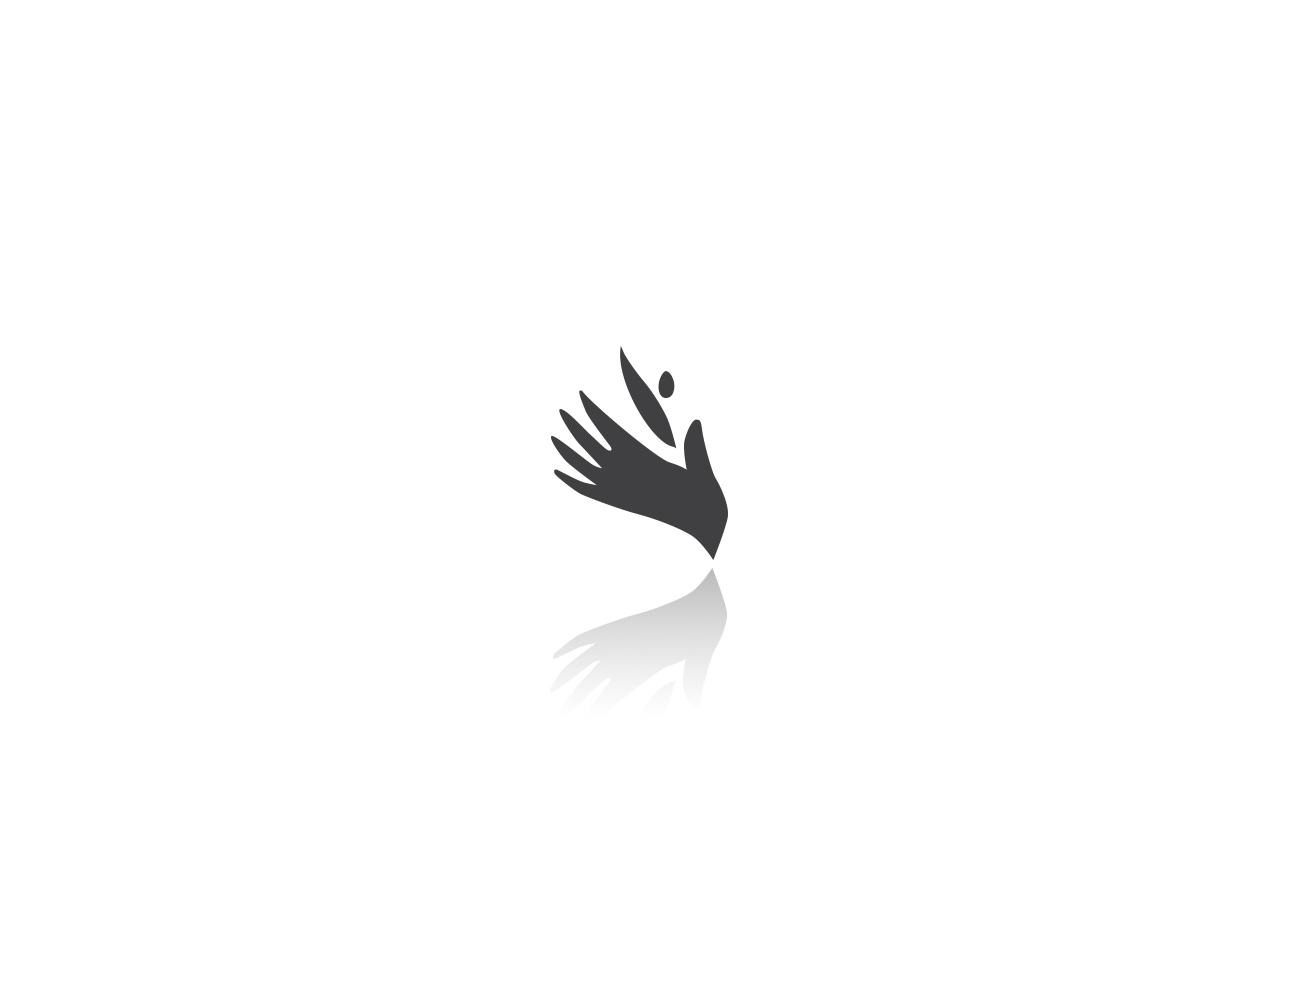 simolivelogodesign1